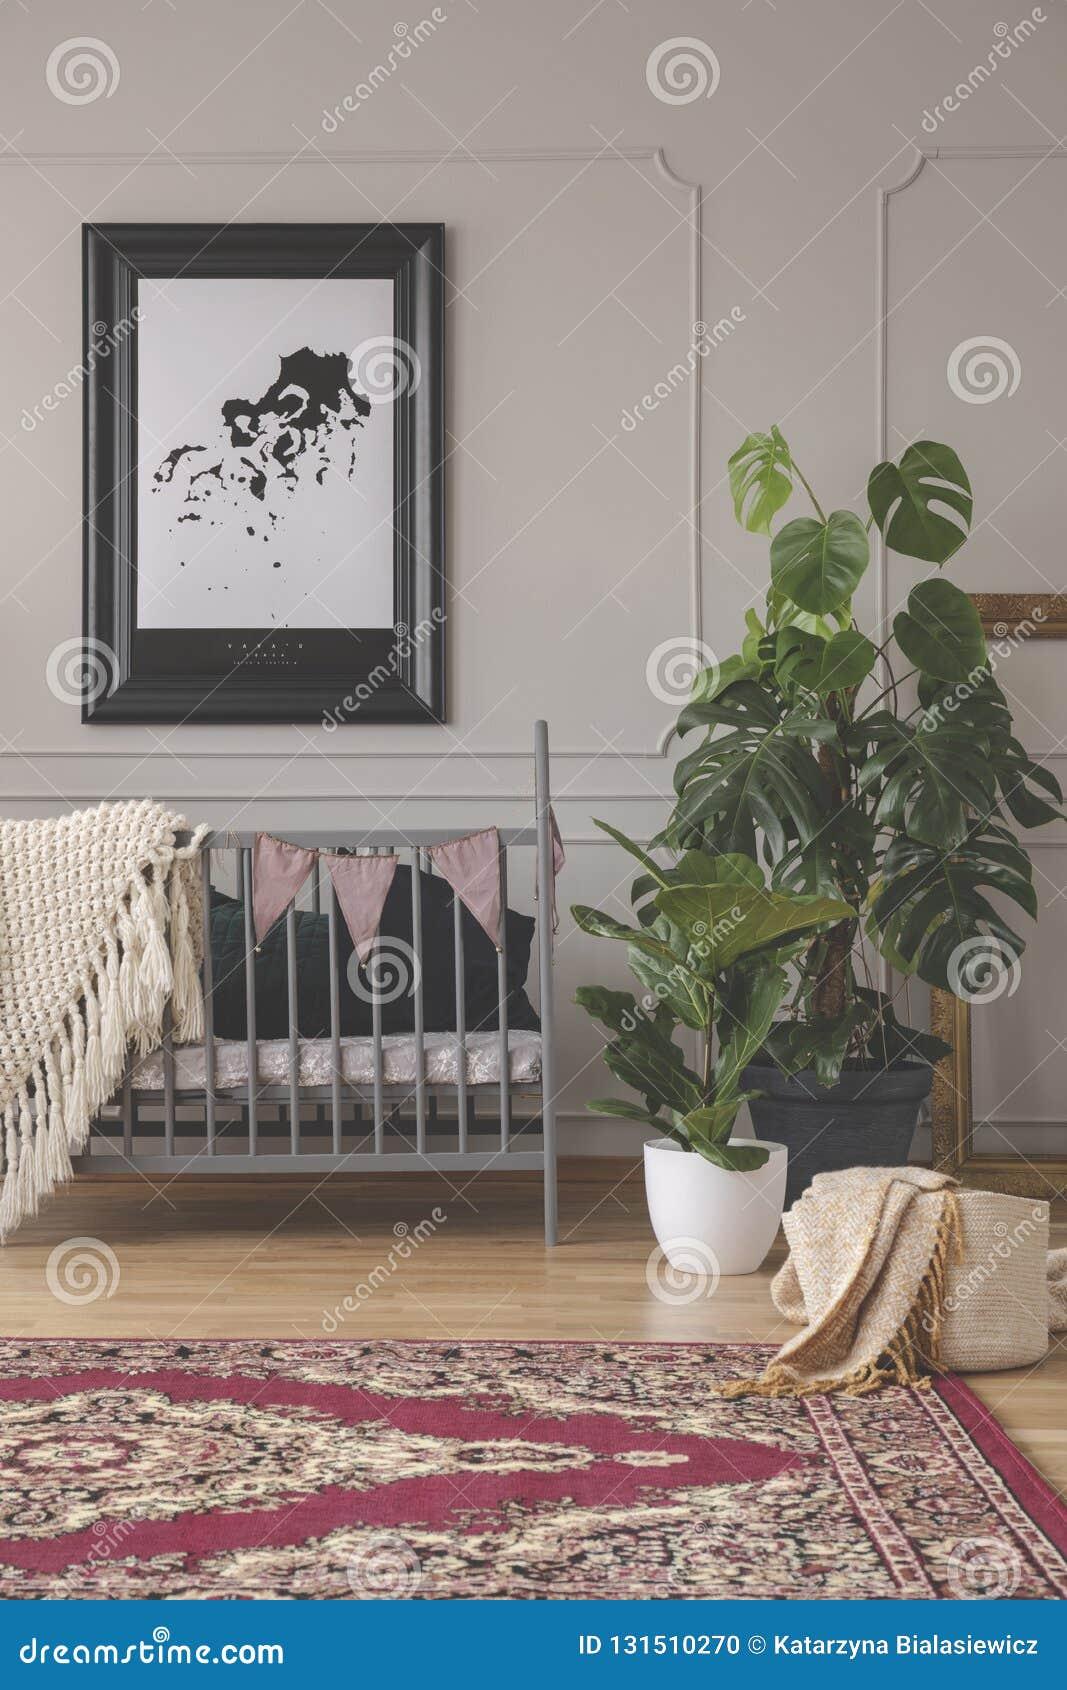 Urban Jungle In Mid Century Baby Room Interior Stock Photo - Image